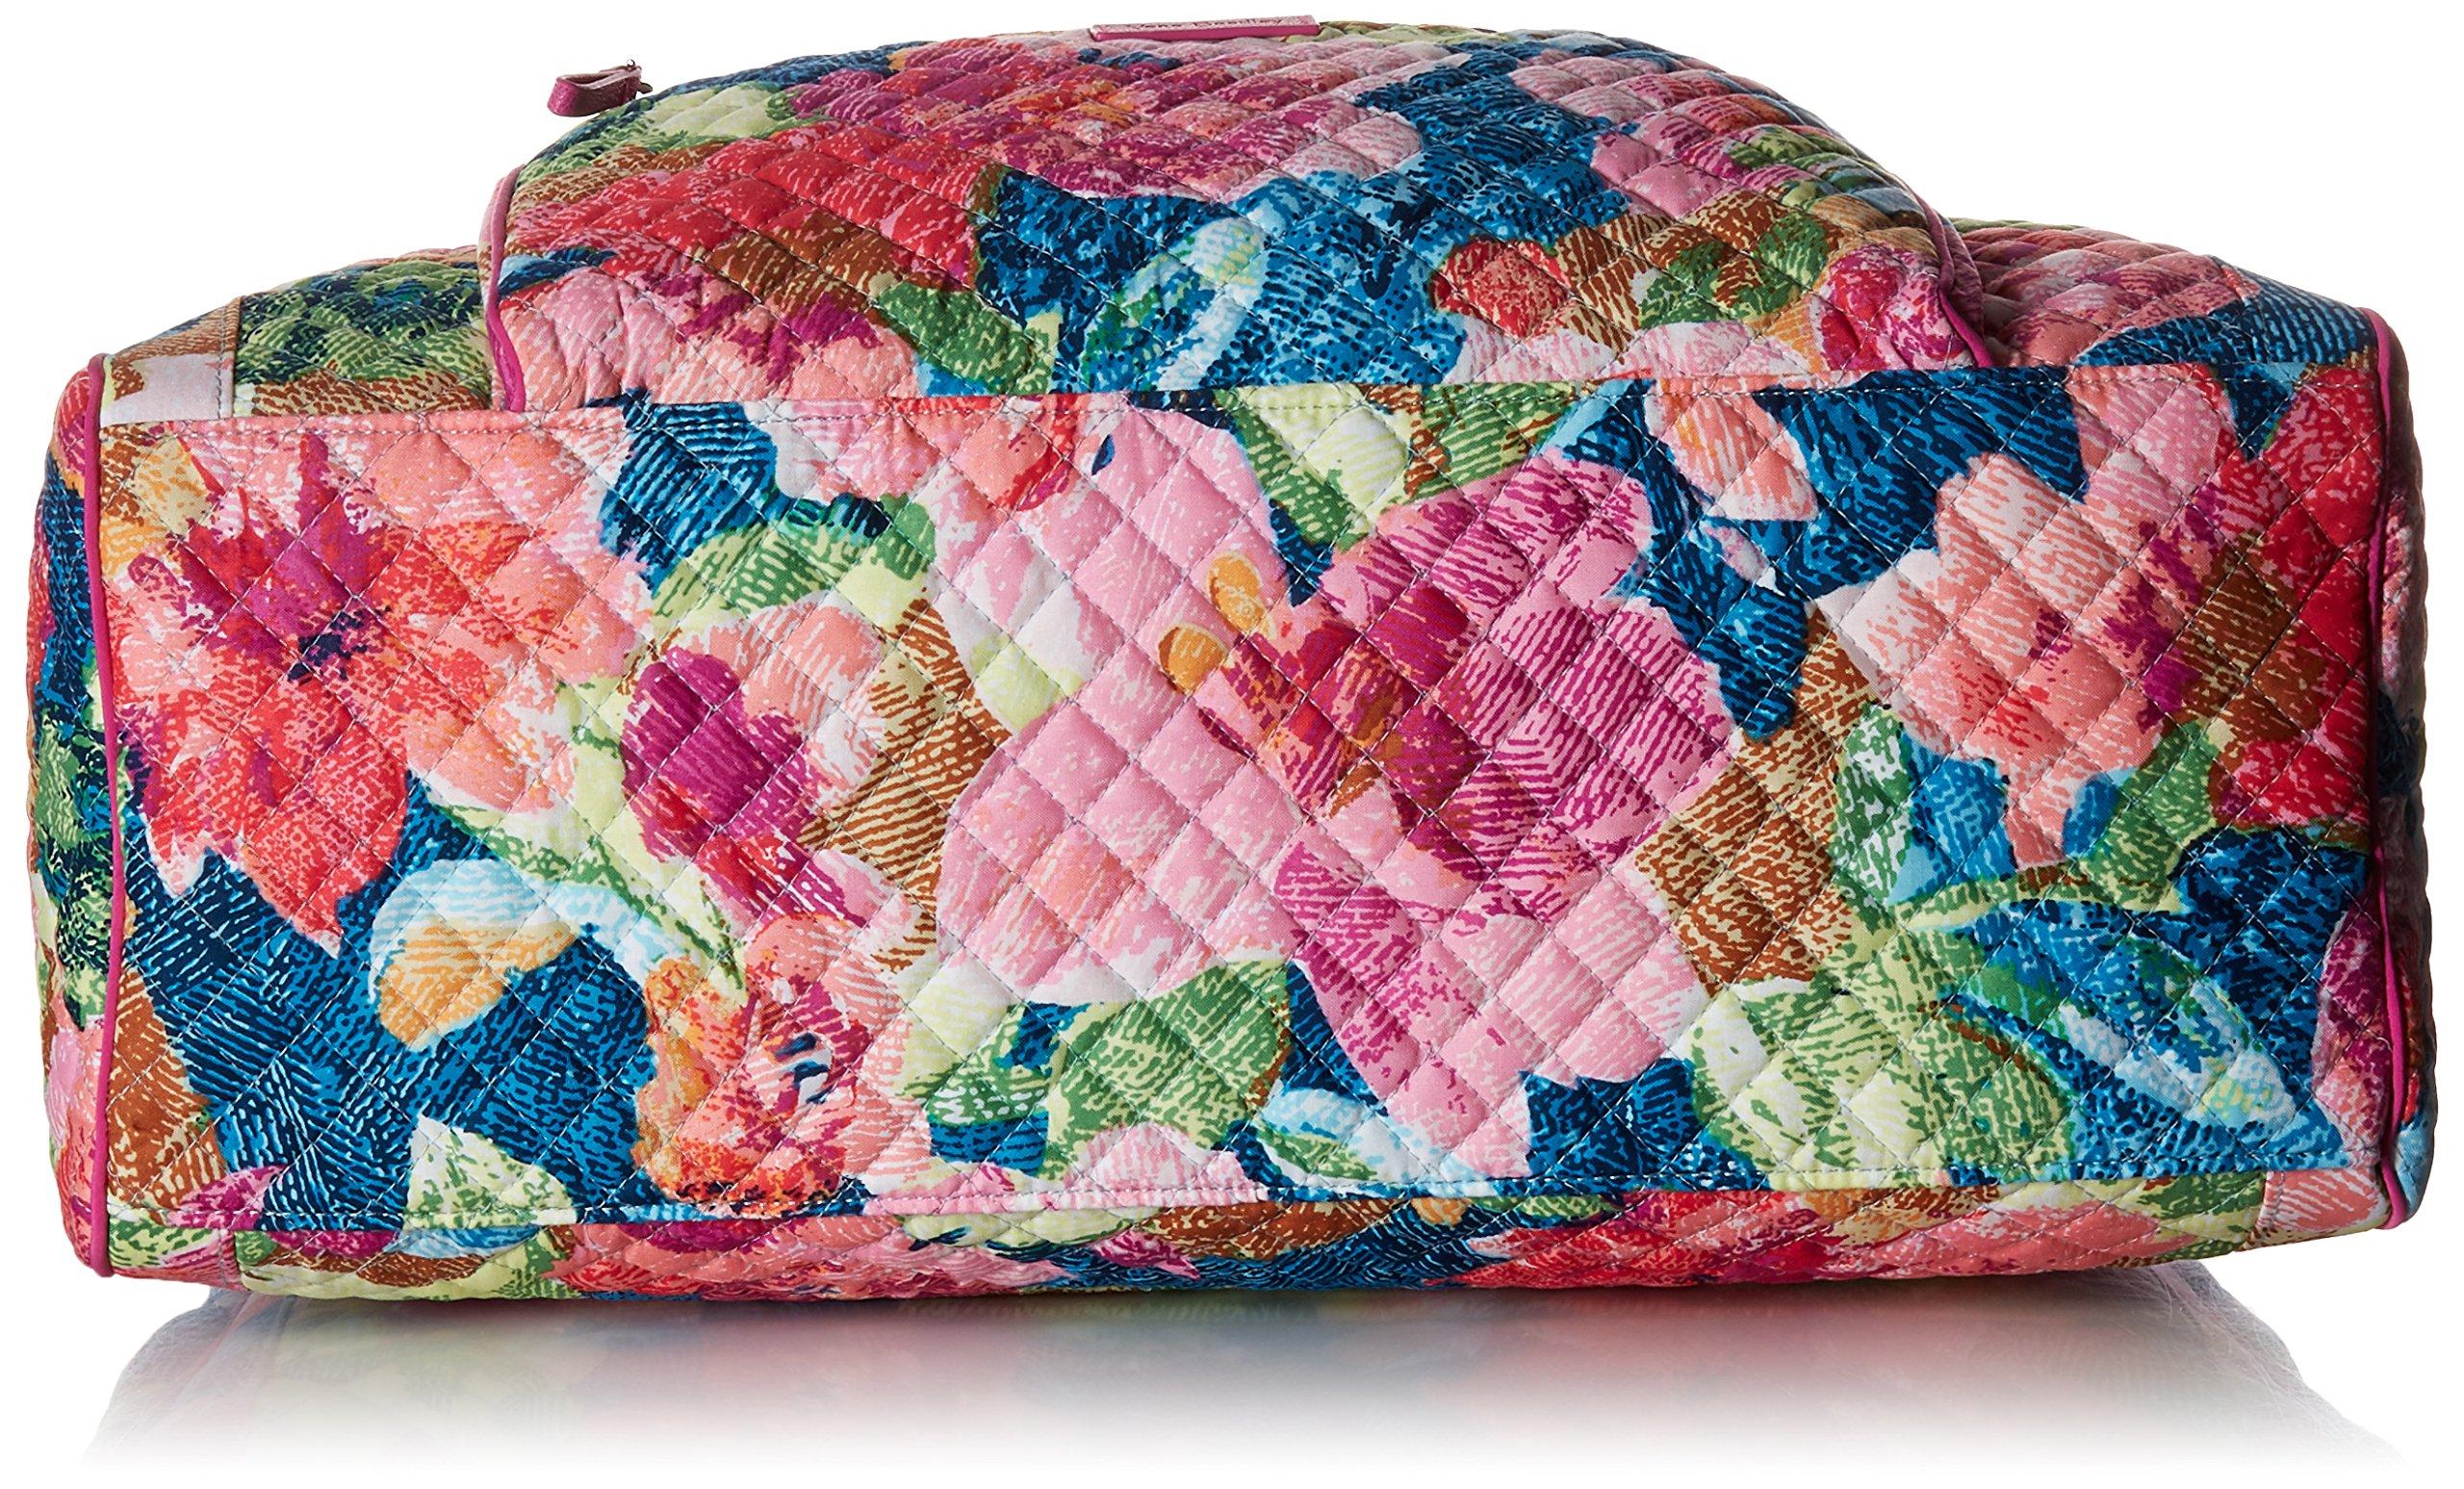 Vera Bradley Iconic Weekender Travel Bag, Signature Cotton, Superbloom by Vera Bradley (Image #5)